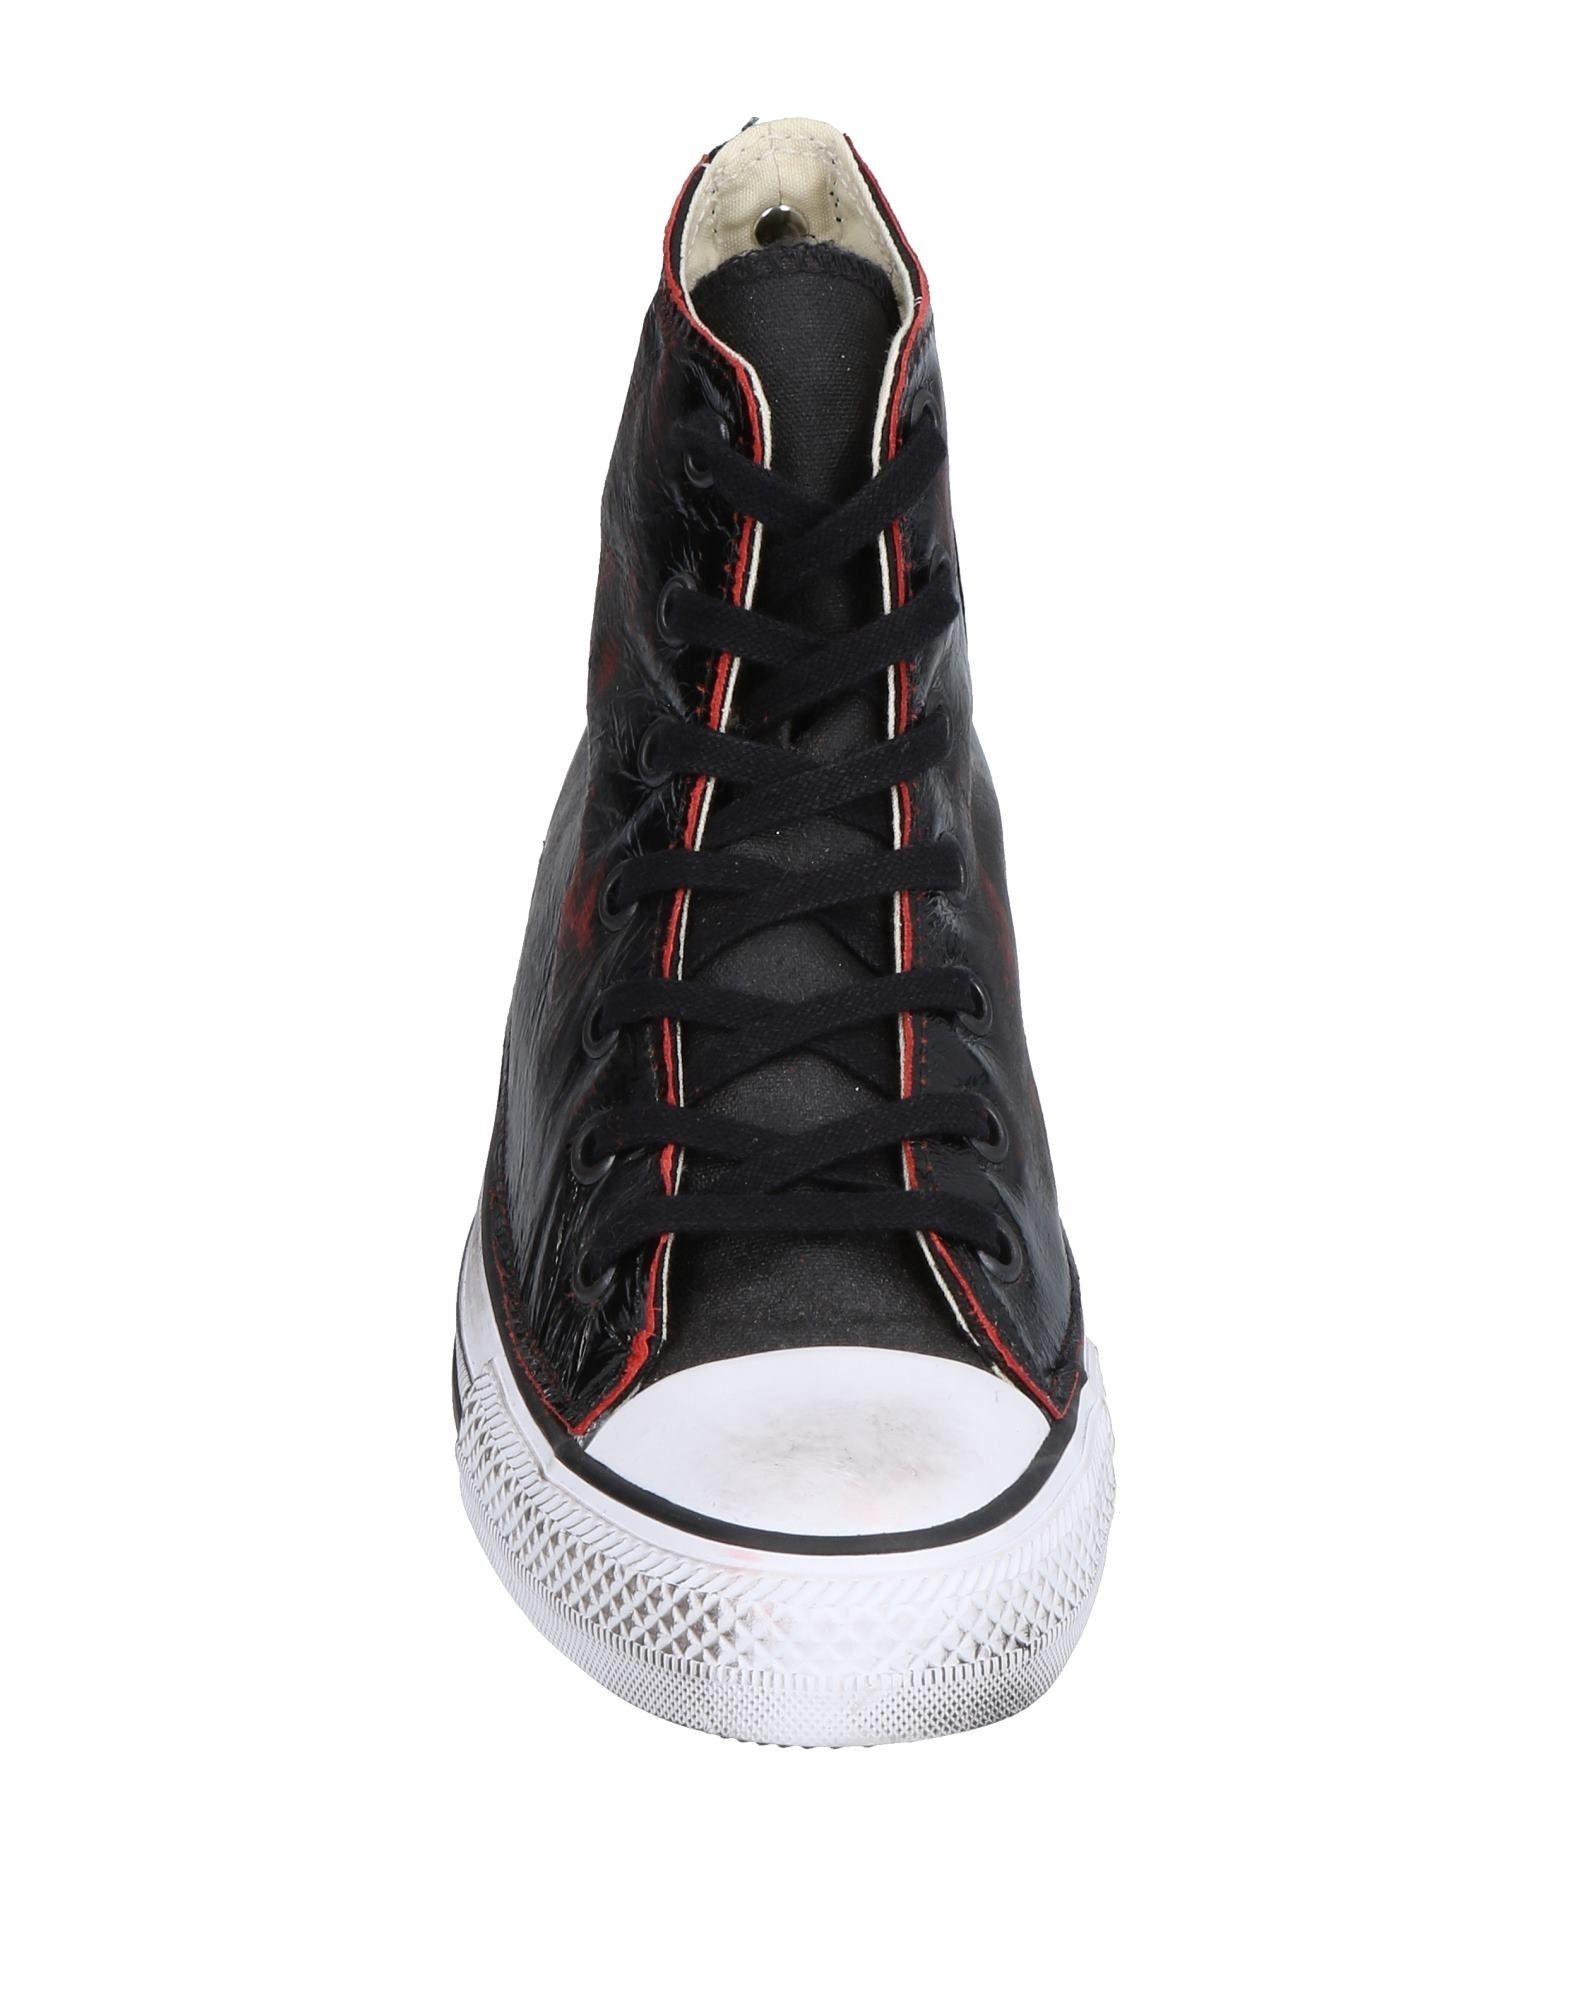 Converse Limited 11507251BB Edition Sneakers Damen  11507251BB Limited Gute Qualität beliebte Schuhe eb4d84